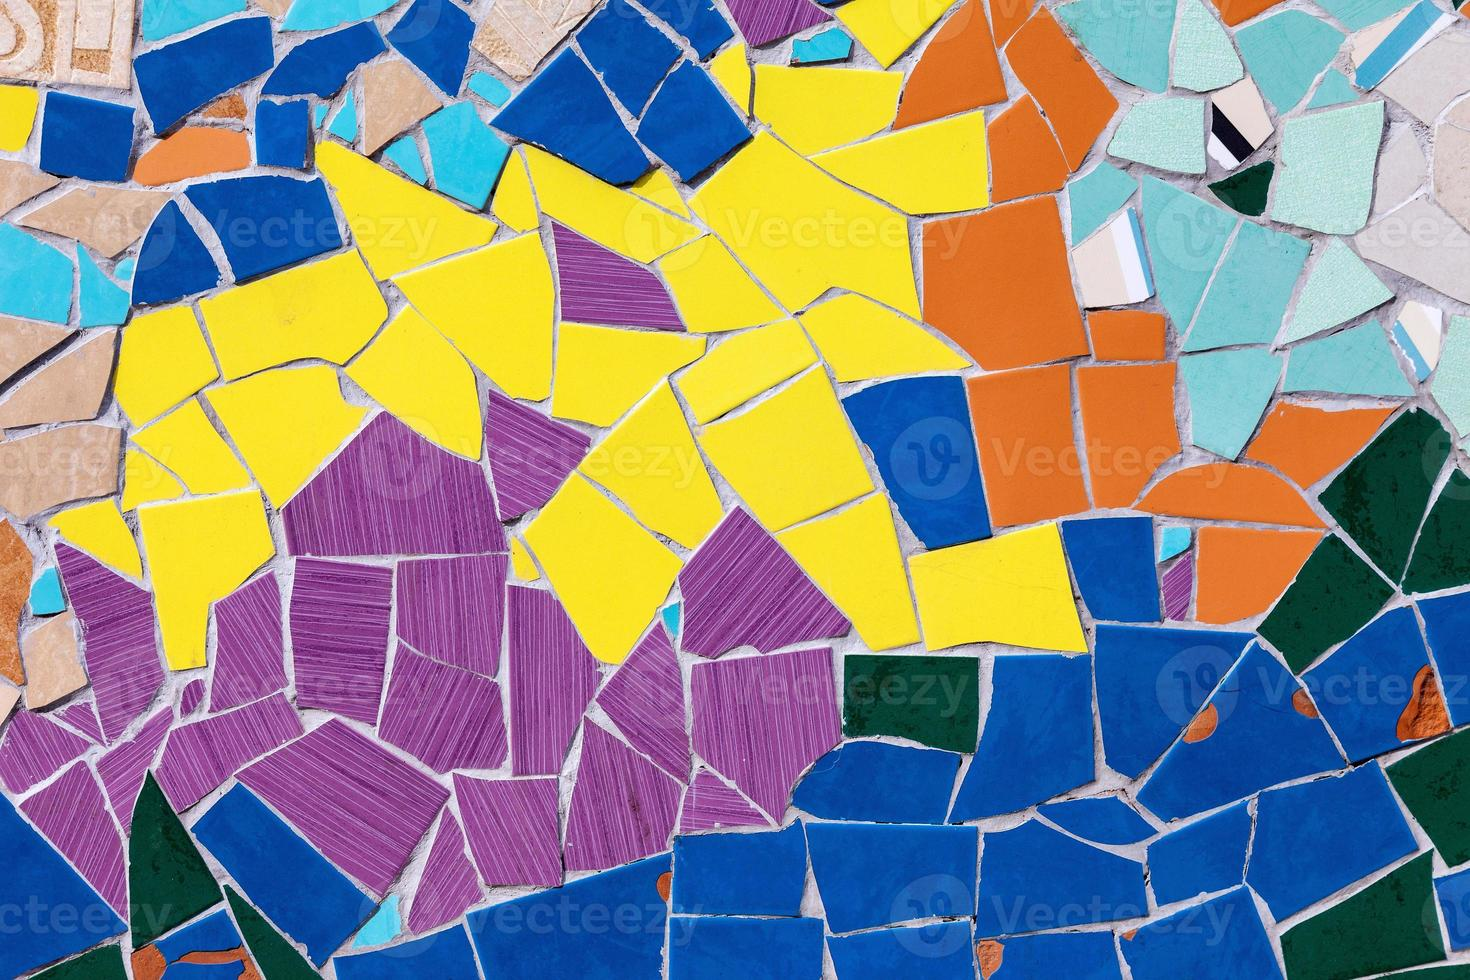 keramiek glas kleurrijke tegels mozaïek samenstelling patroon foto